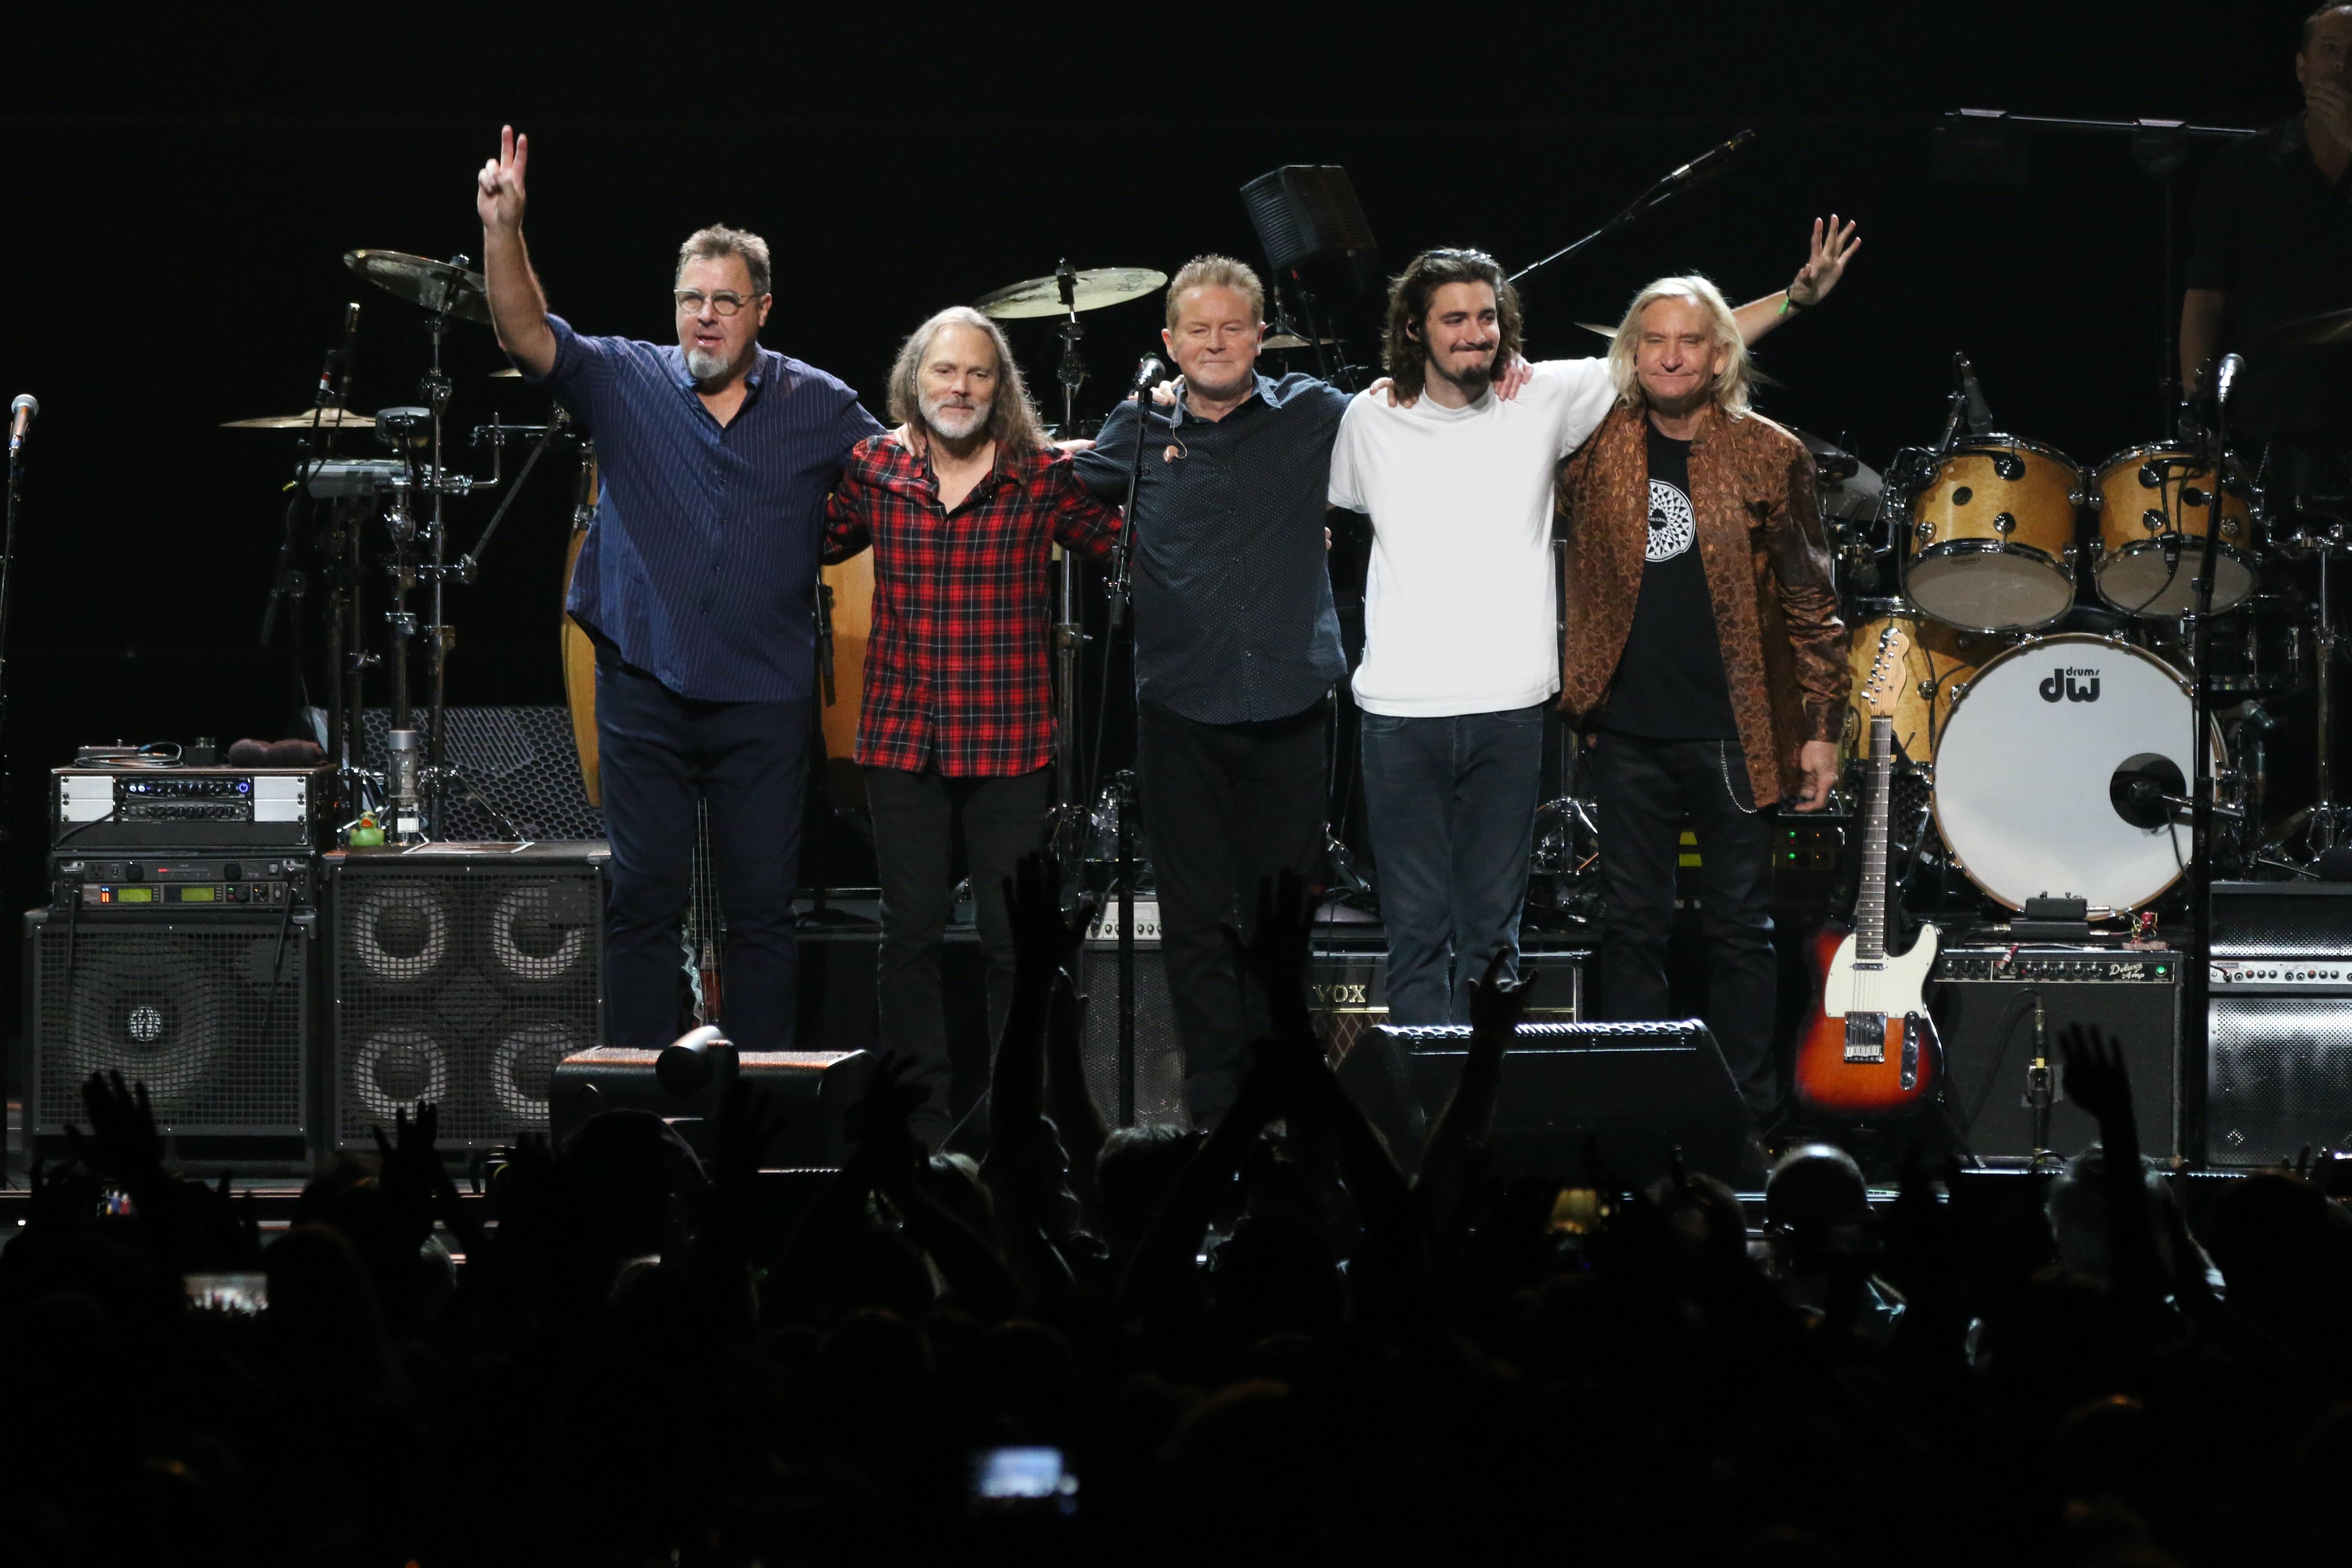 Eagles 2020 Tour | American Airlines Center in Dallas